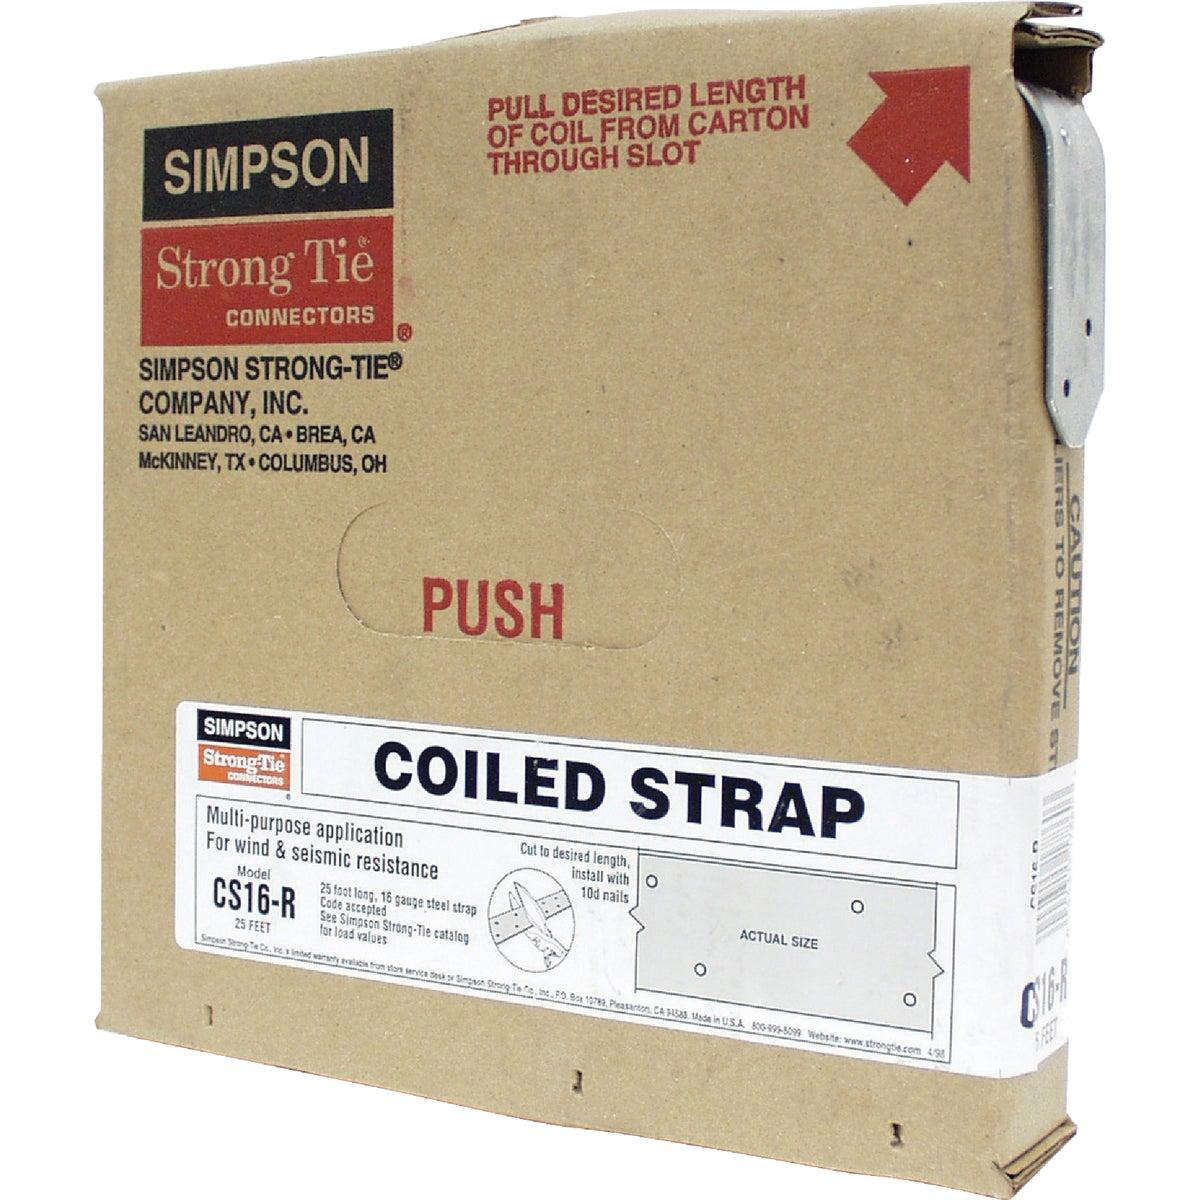 Simpson Strong-Tie 25' 16GA COILED STRAP CS16-R